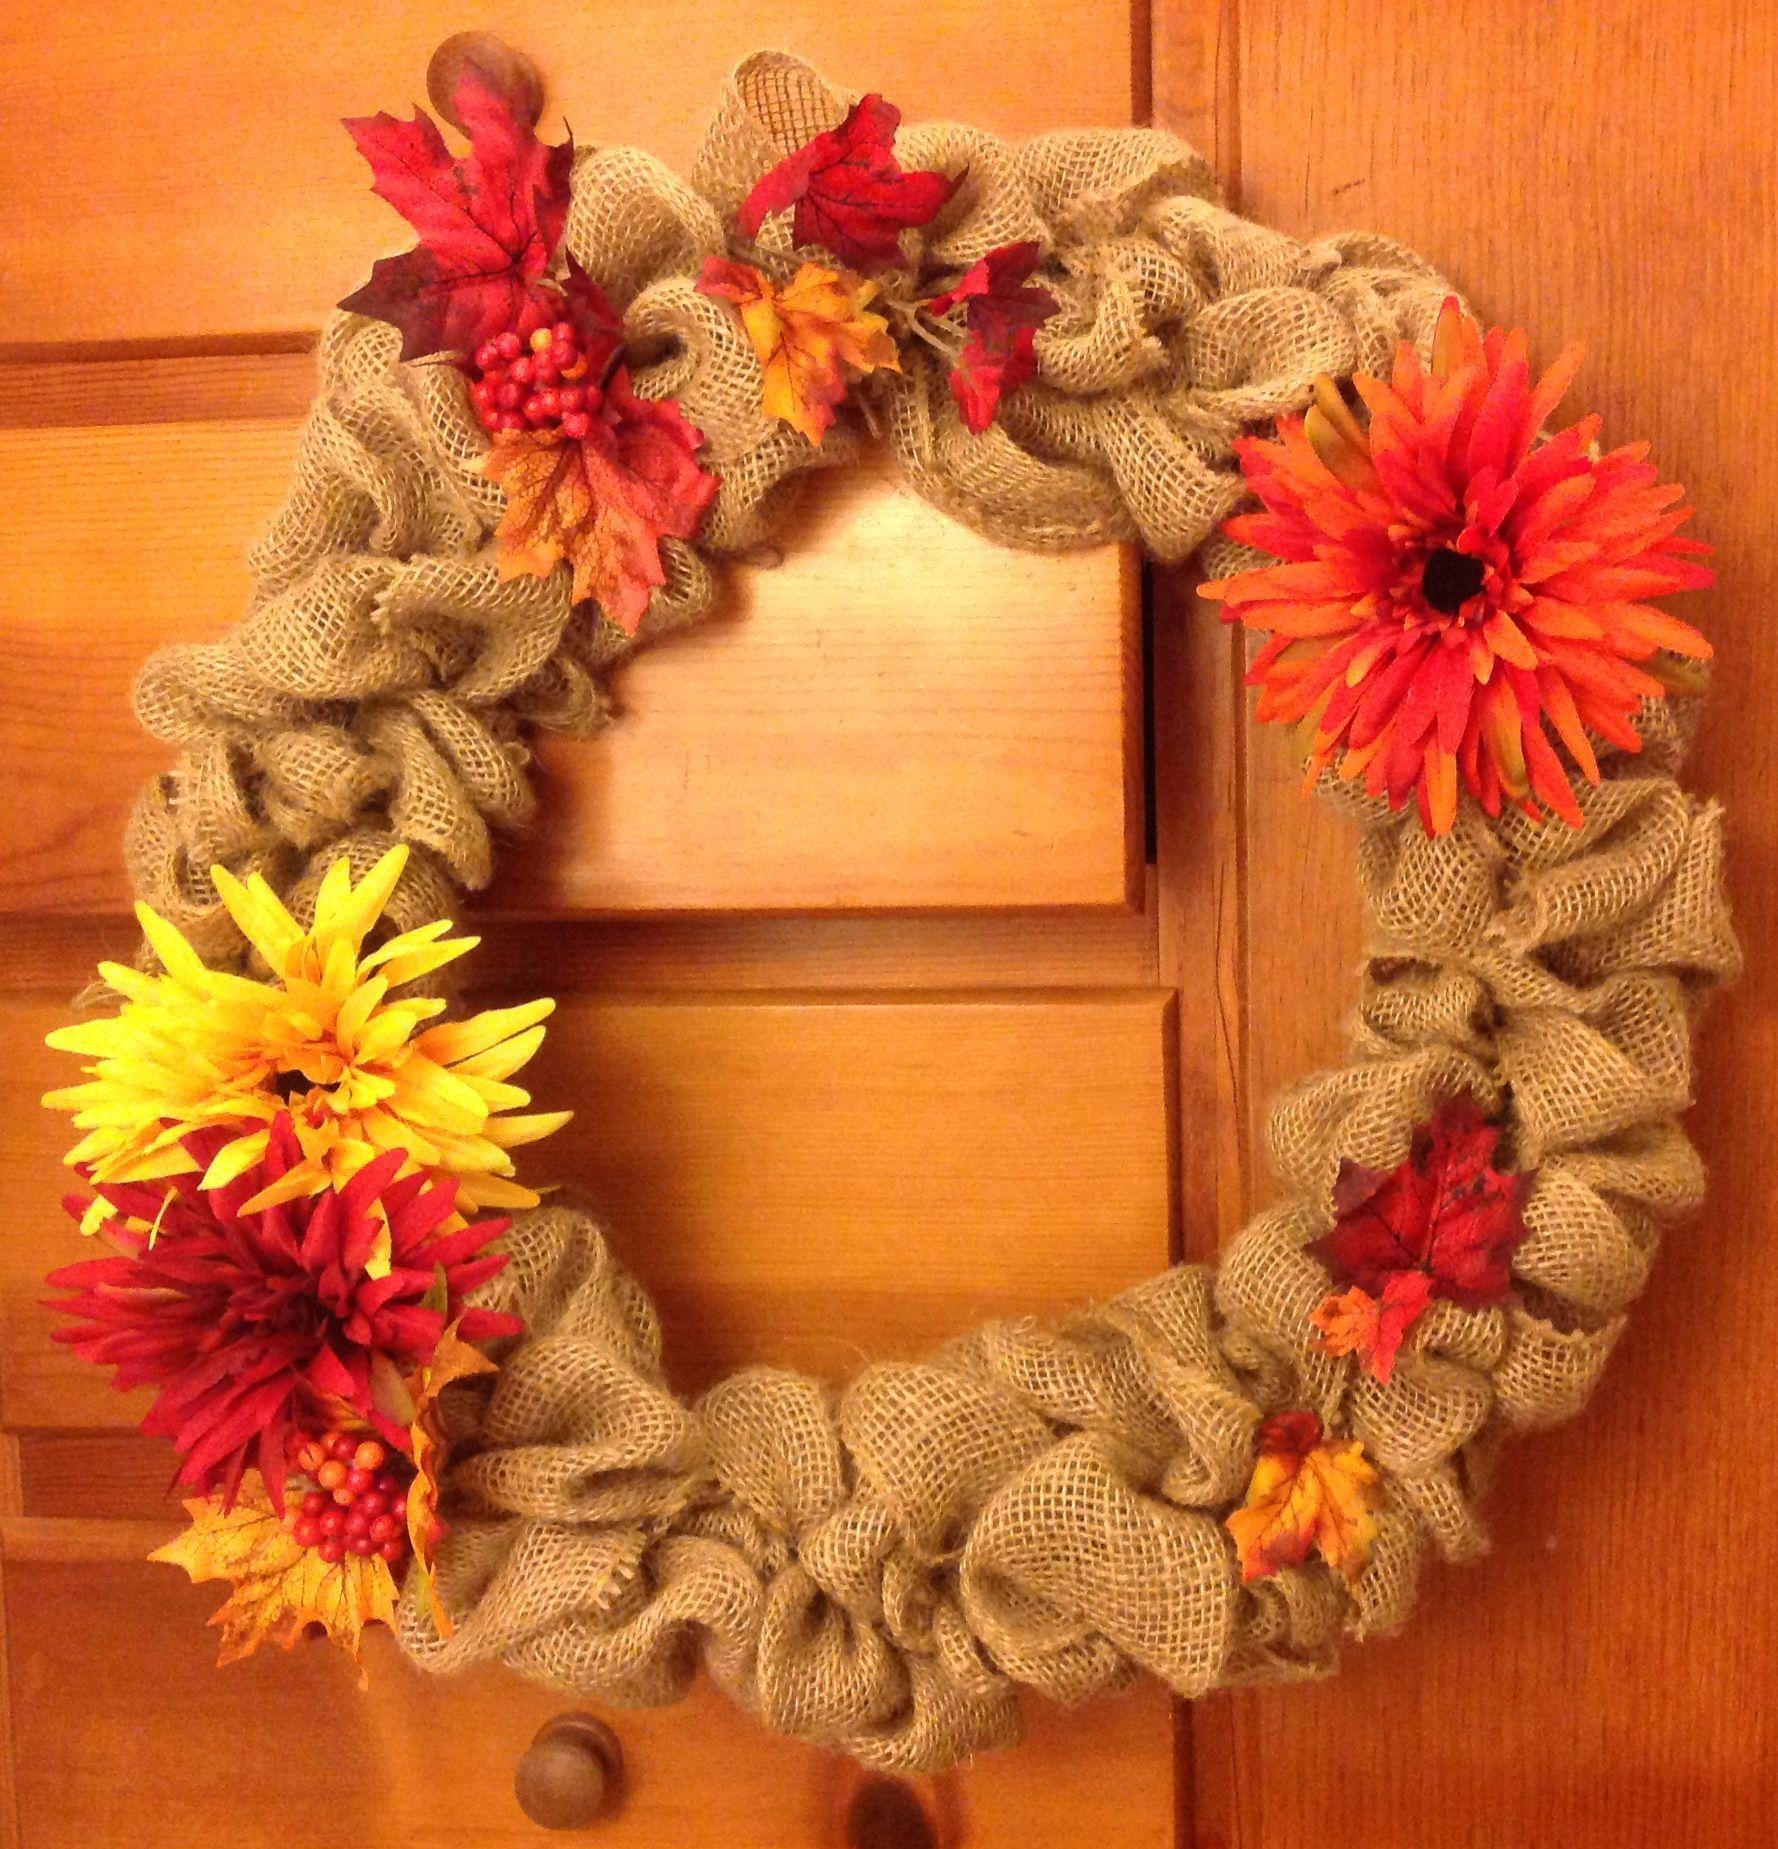 DIY burlap wreathpretty easy and pretty cheap! Materials